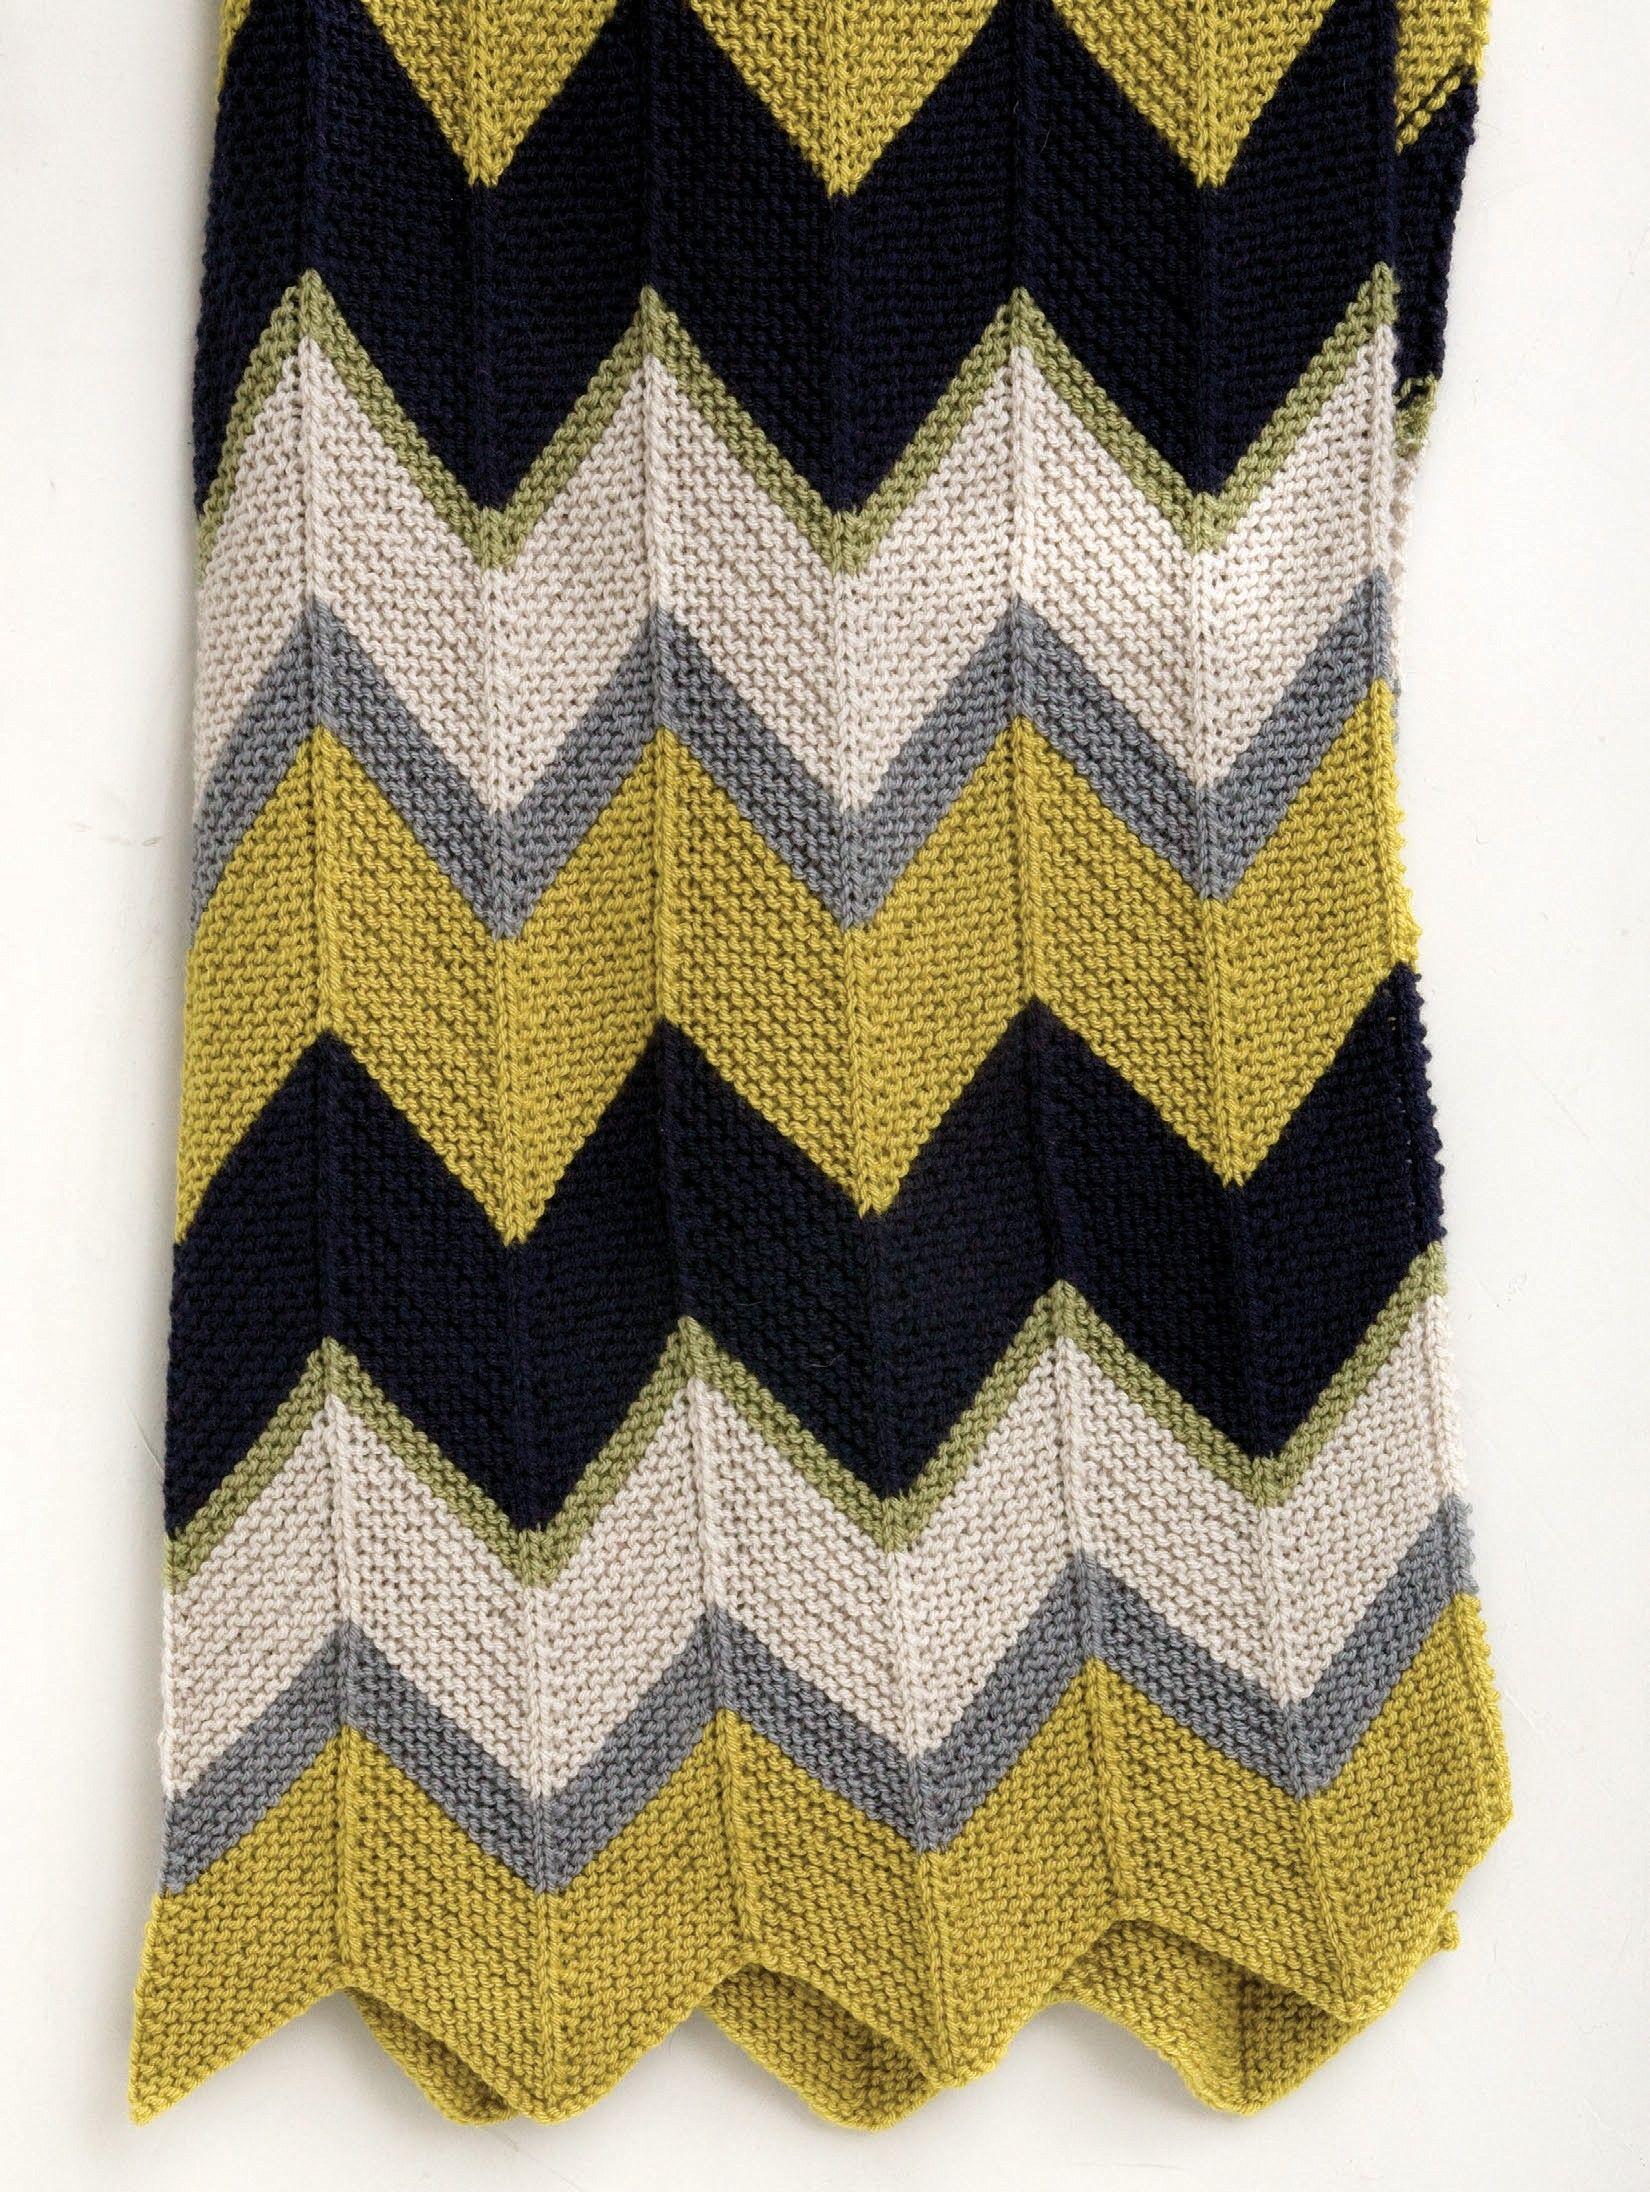 Updated Ripple Afghan (Knit) | knitting | Pinterest | Ripple afghan ...